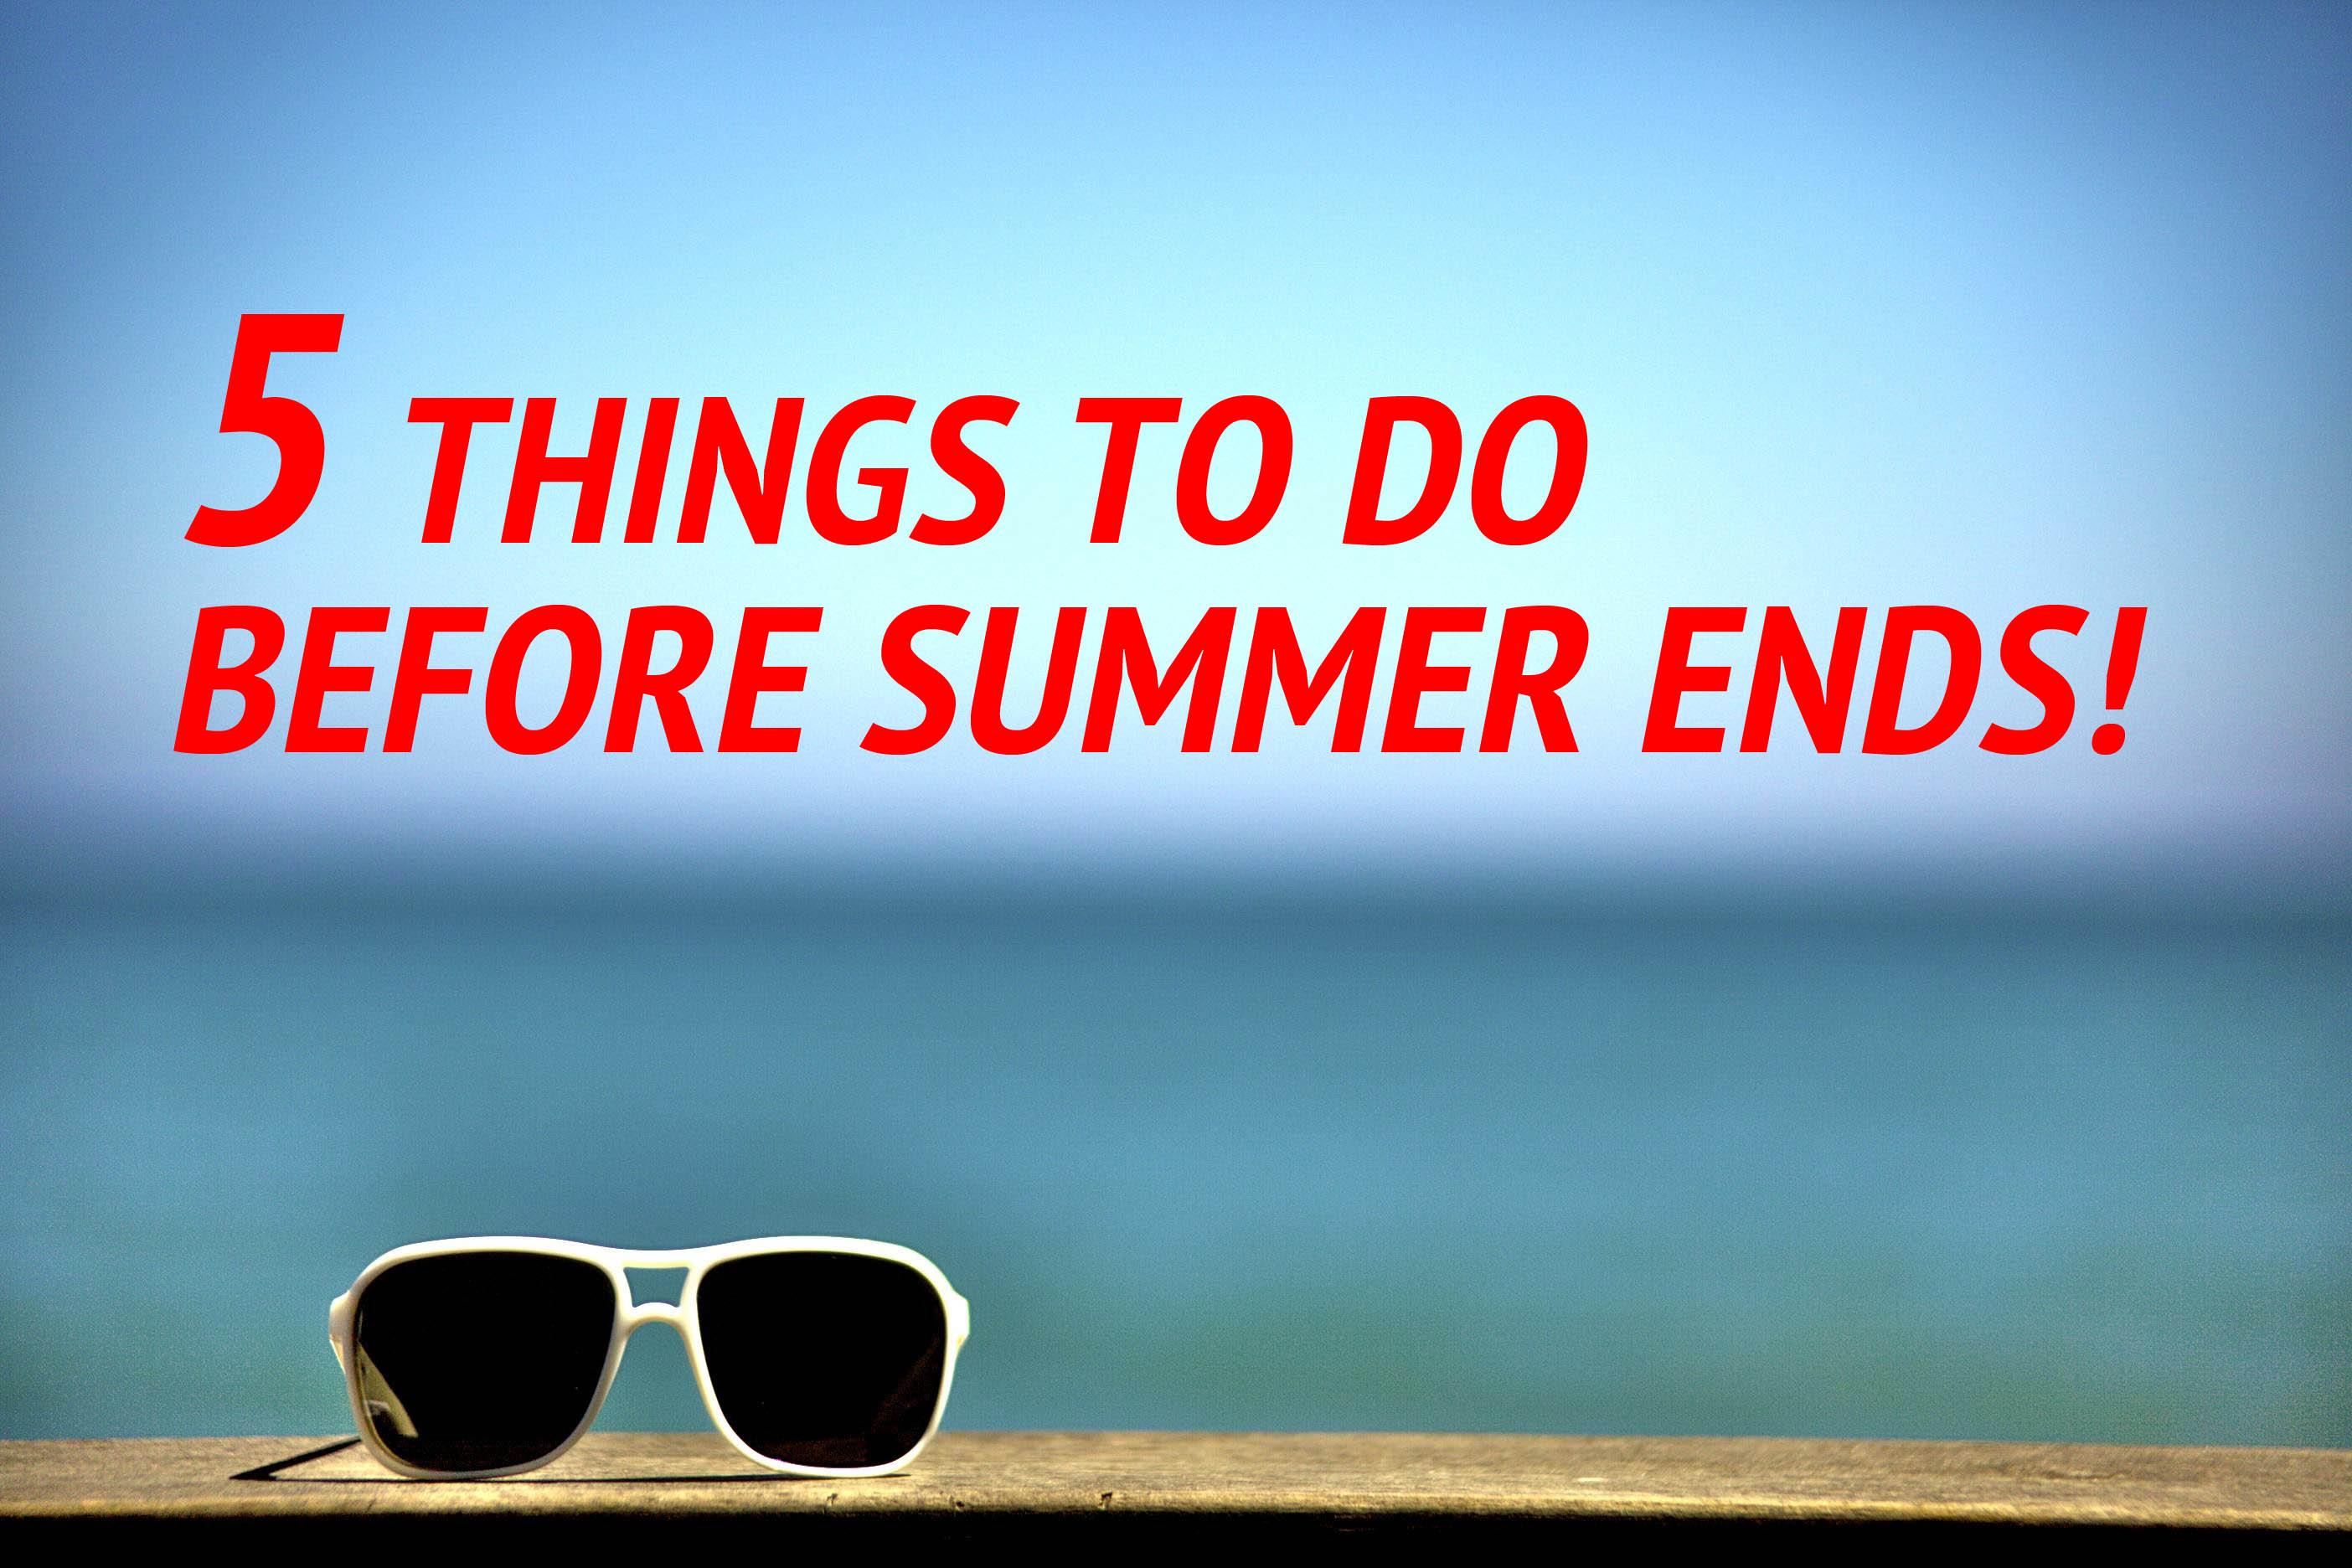 summer_sunglasses_2_copy_EN.jpg